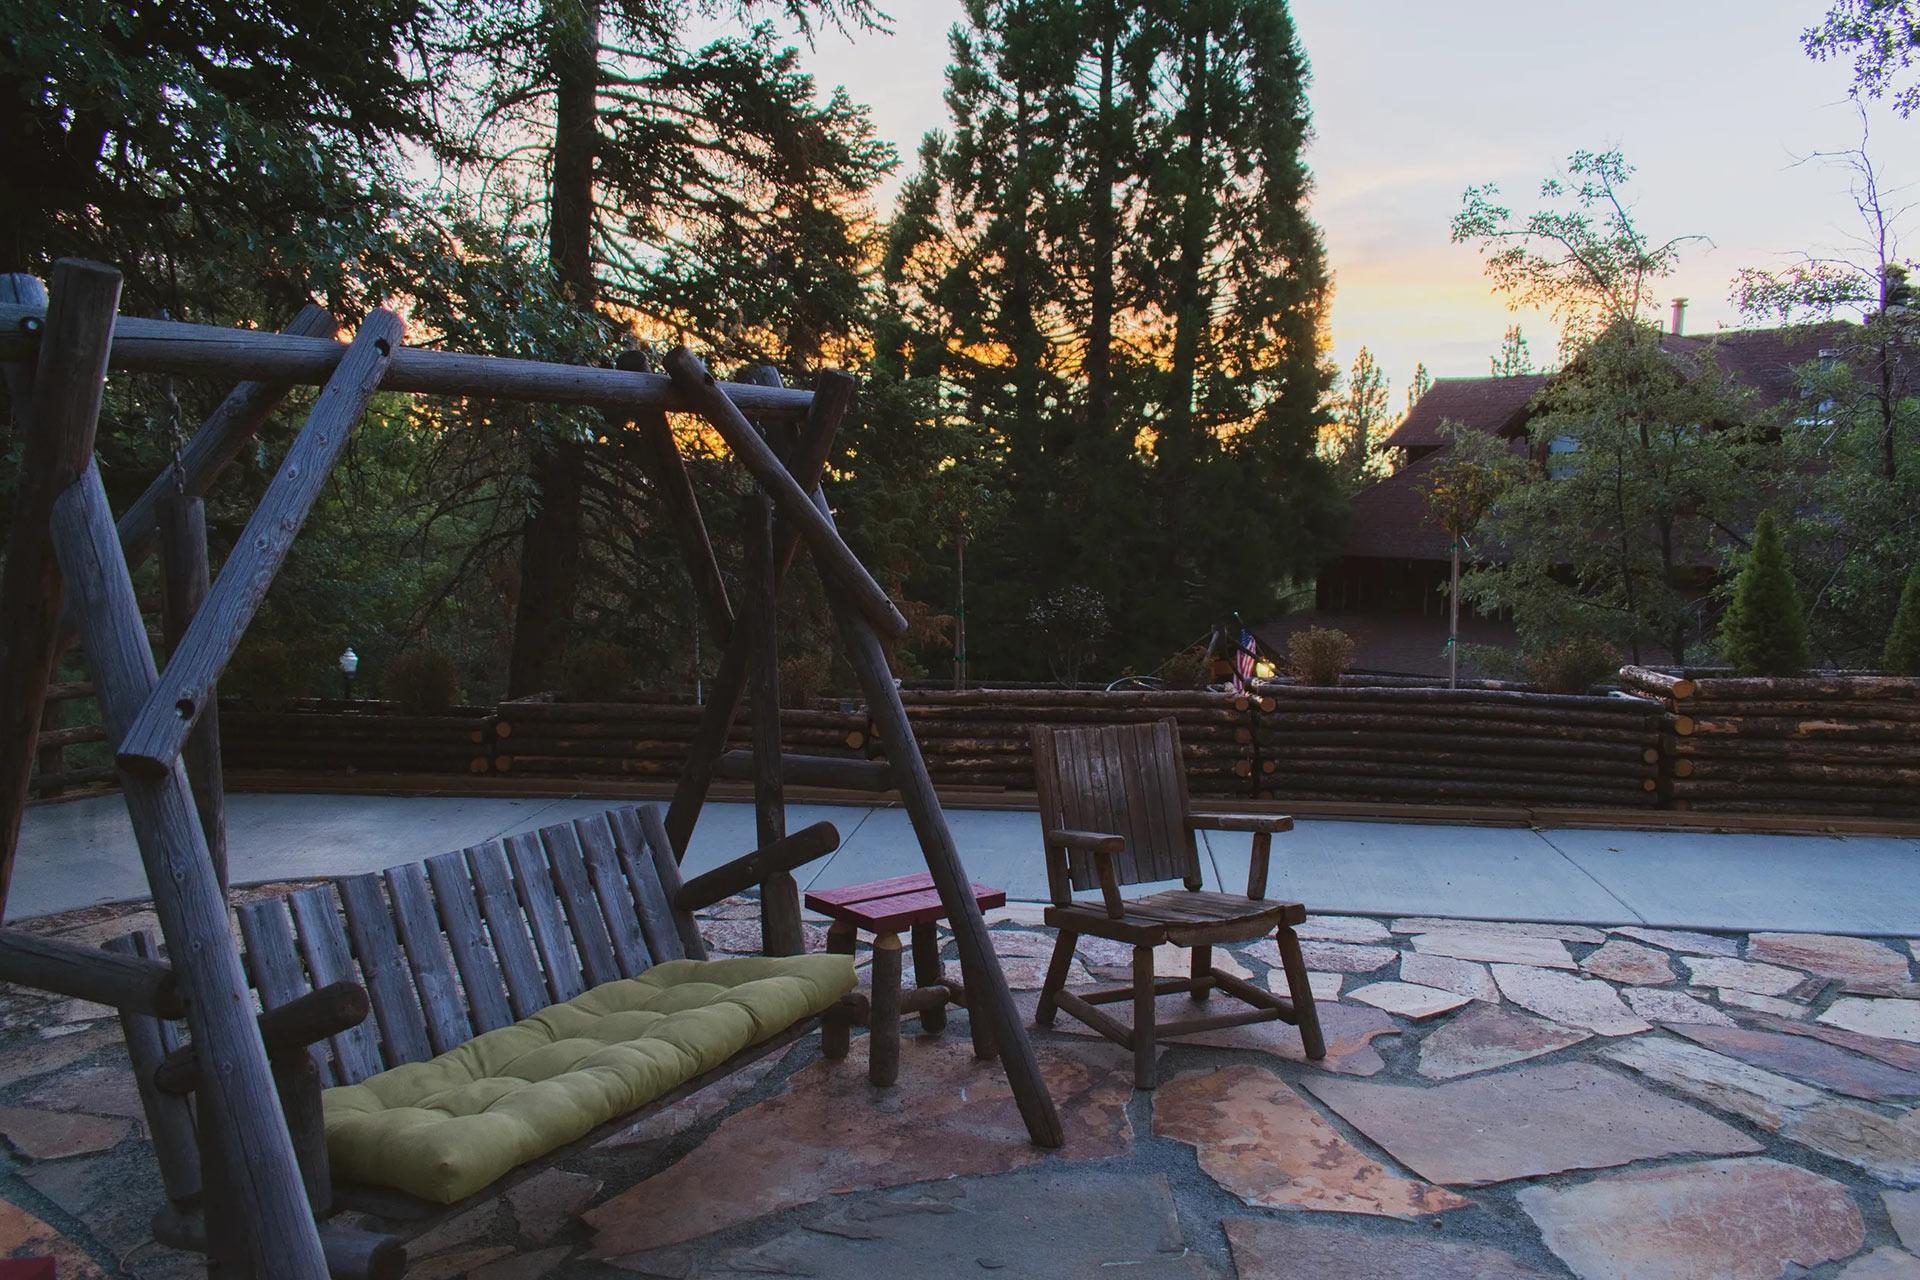 View of sun setting in Big Bear Lake from the Knickerbocker courtyard